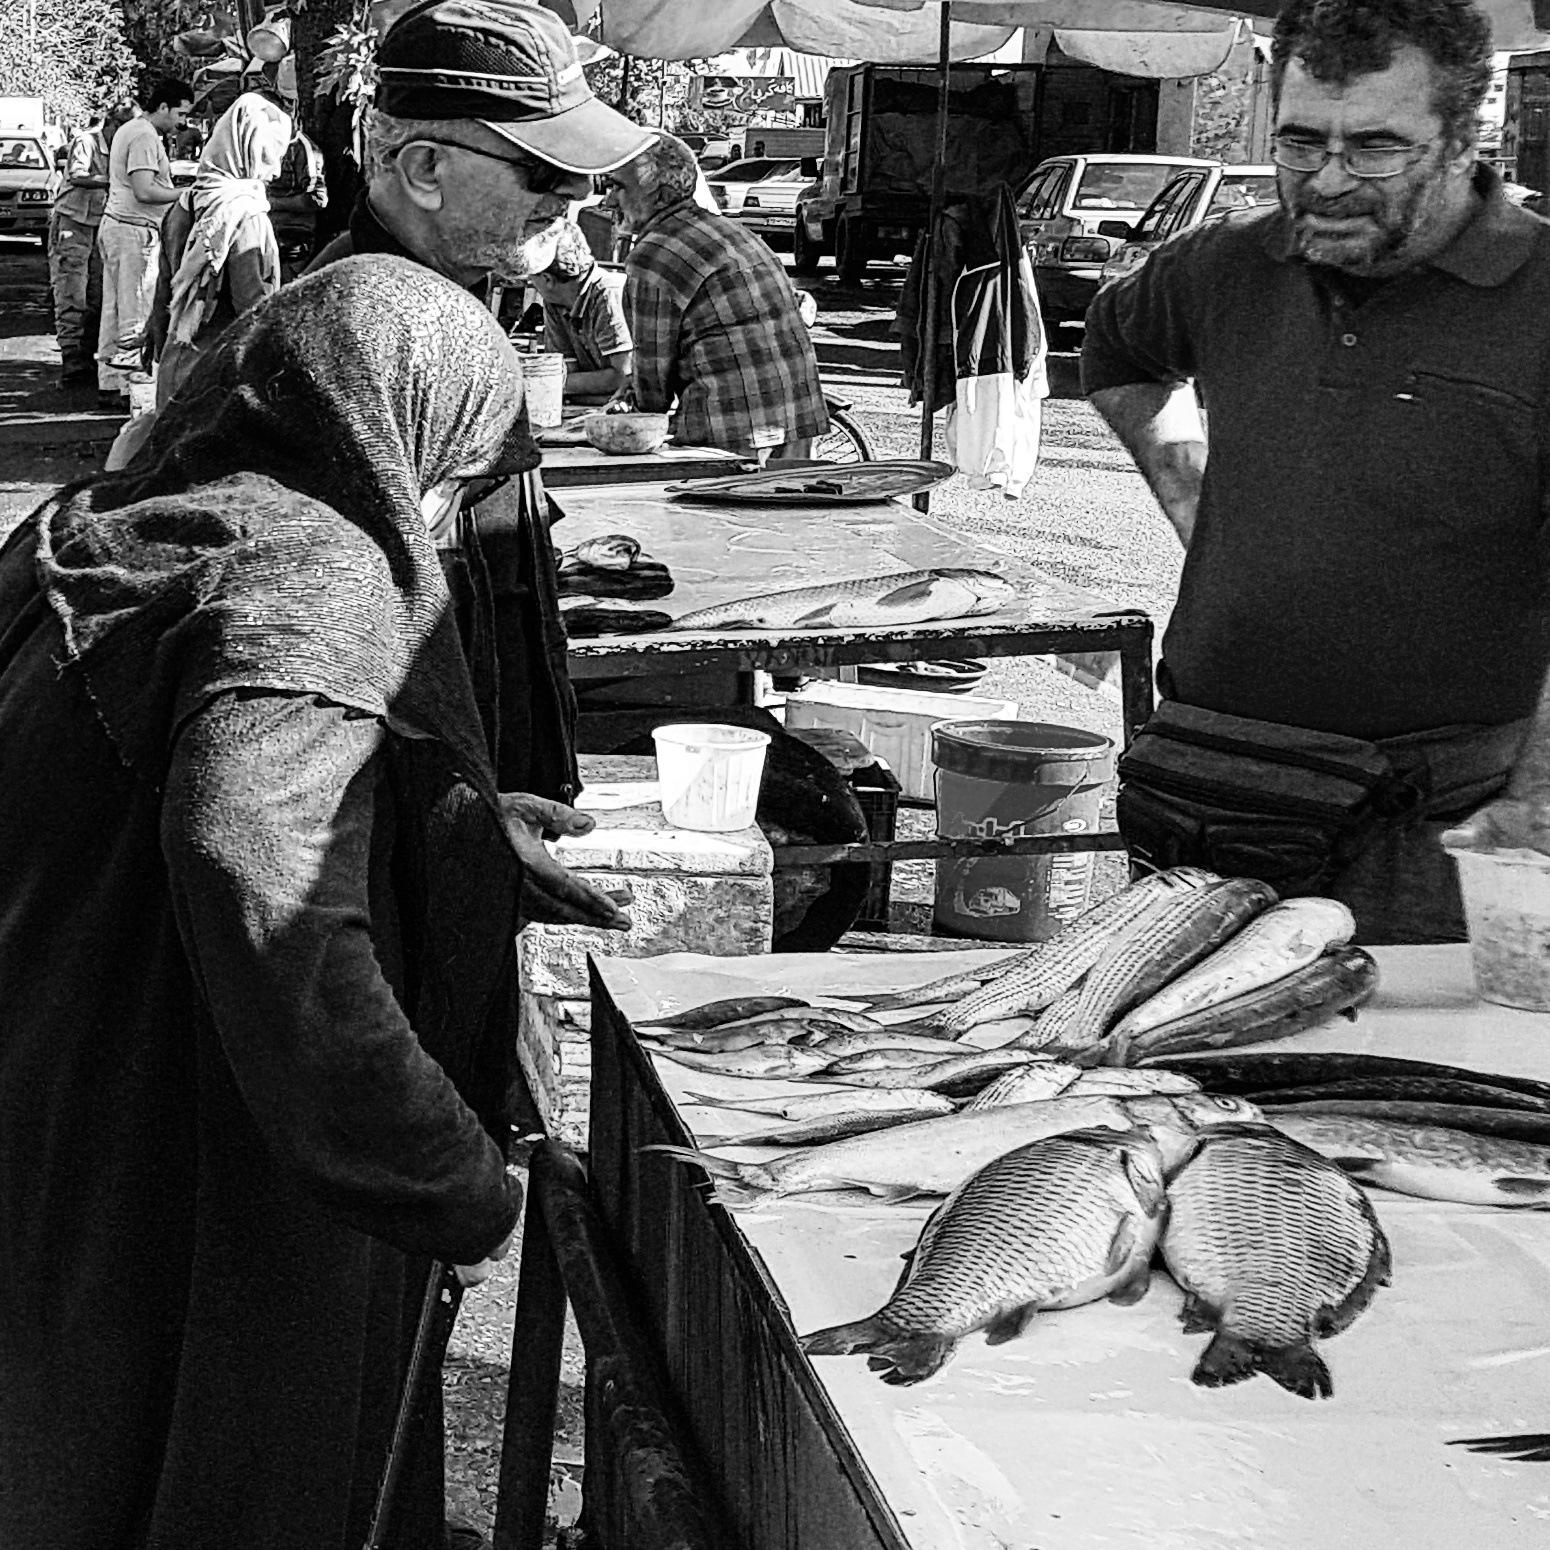 Fish market by taherikambiz